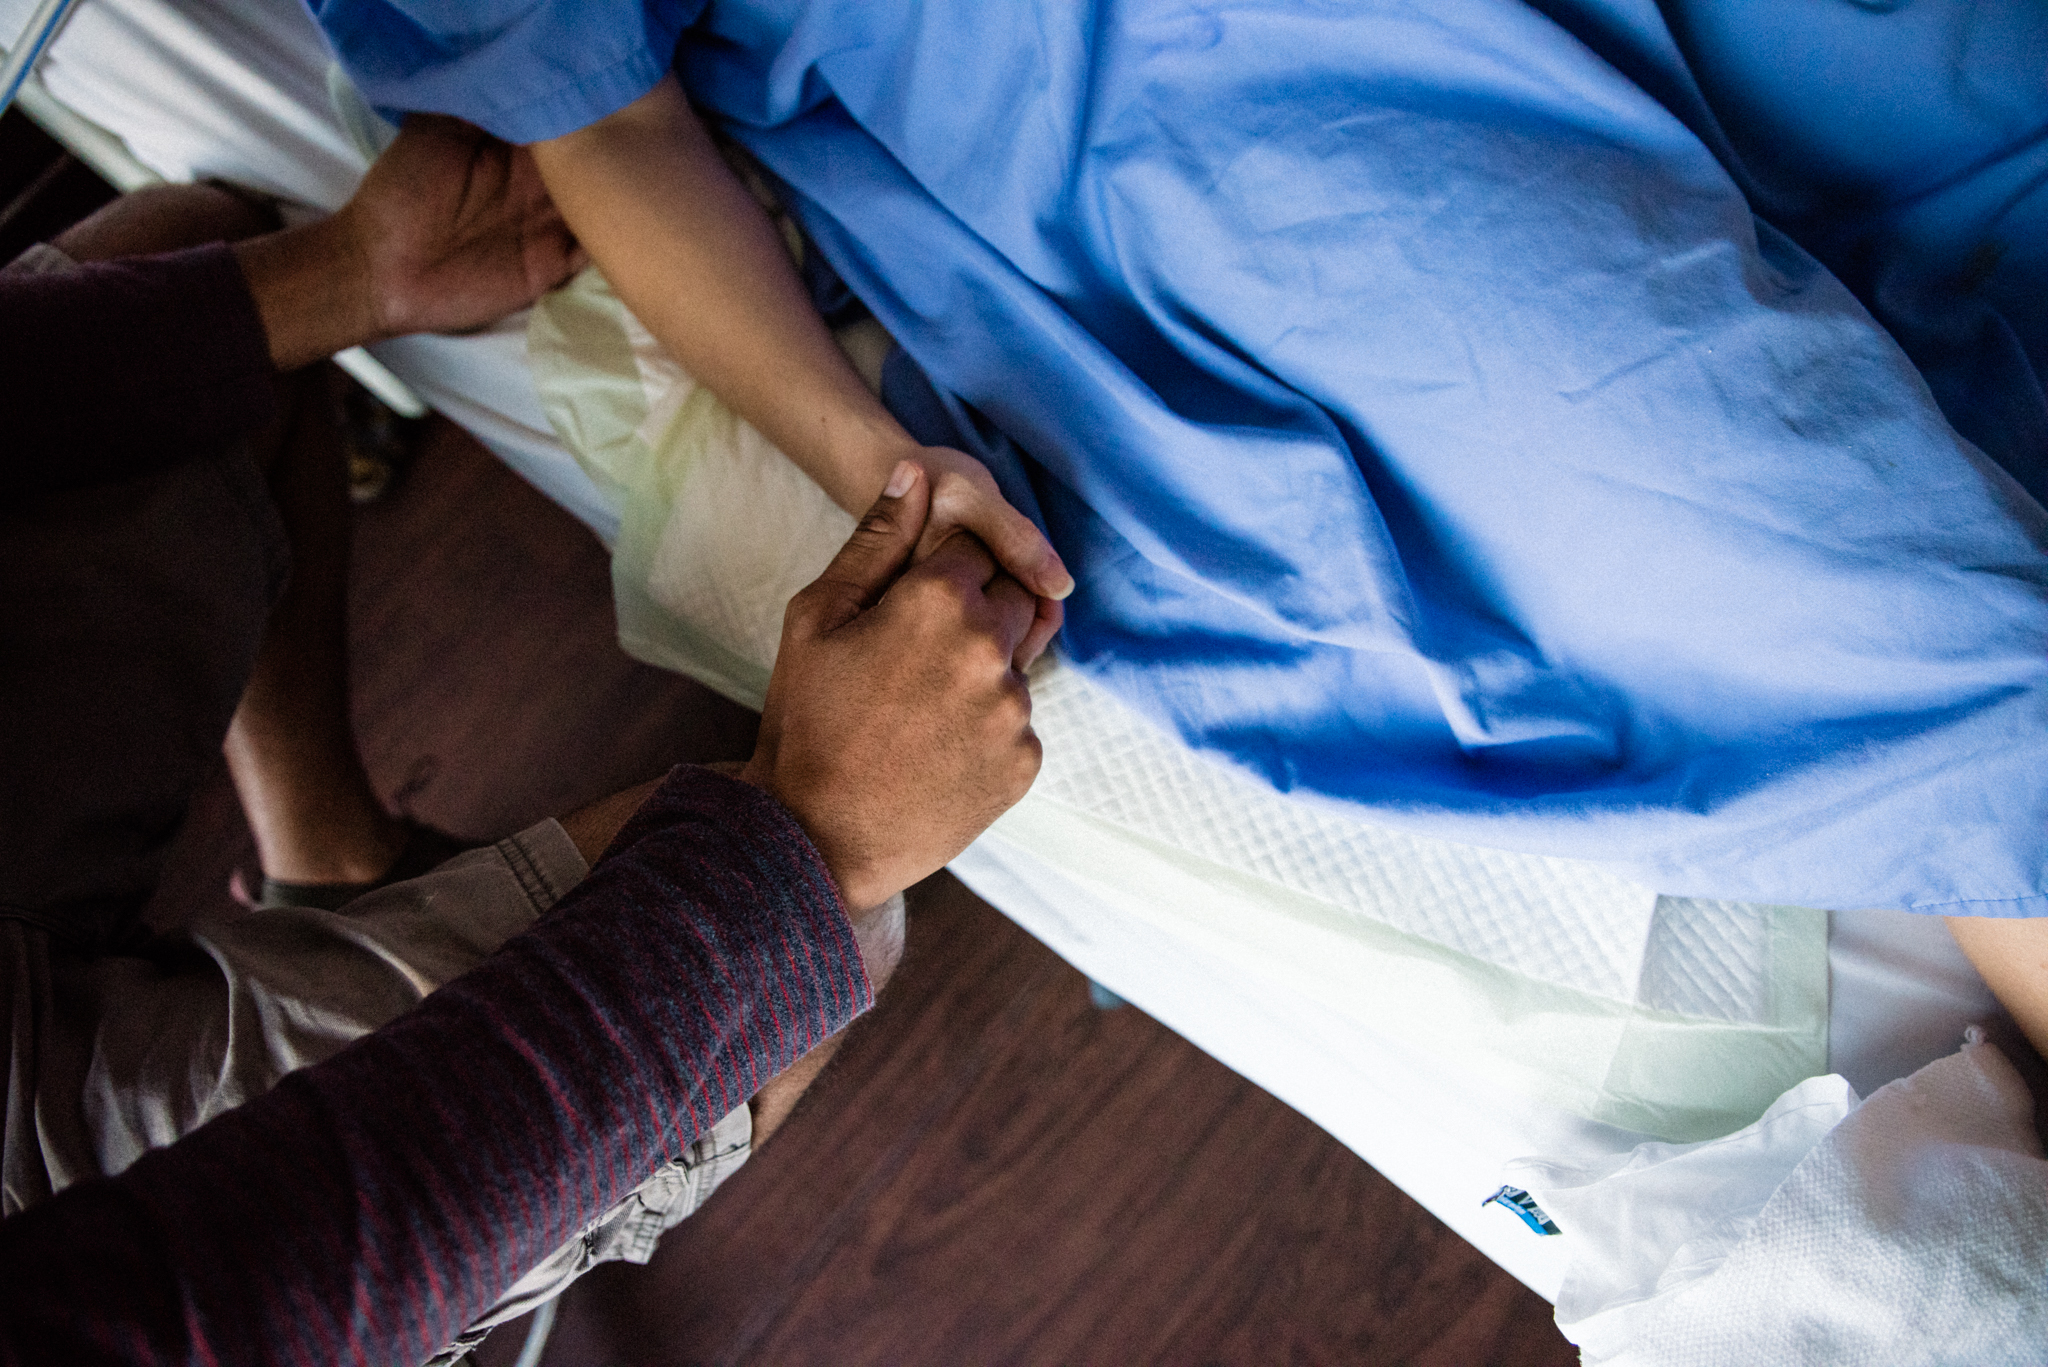 Lana Photographs Dubai Birth Photographer image of man holding his wife's hand while she is in labor inside the labor ward at Dubai Mediclinic City Hospital